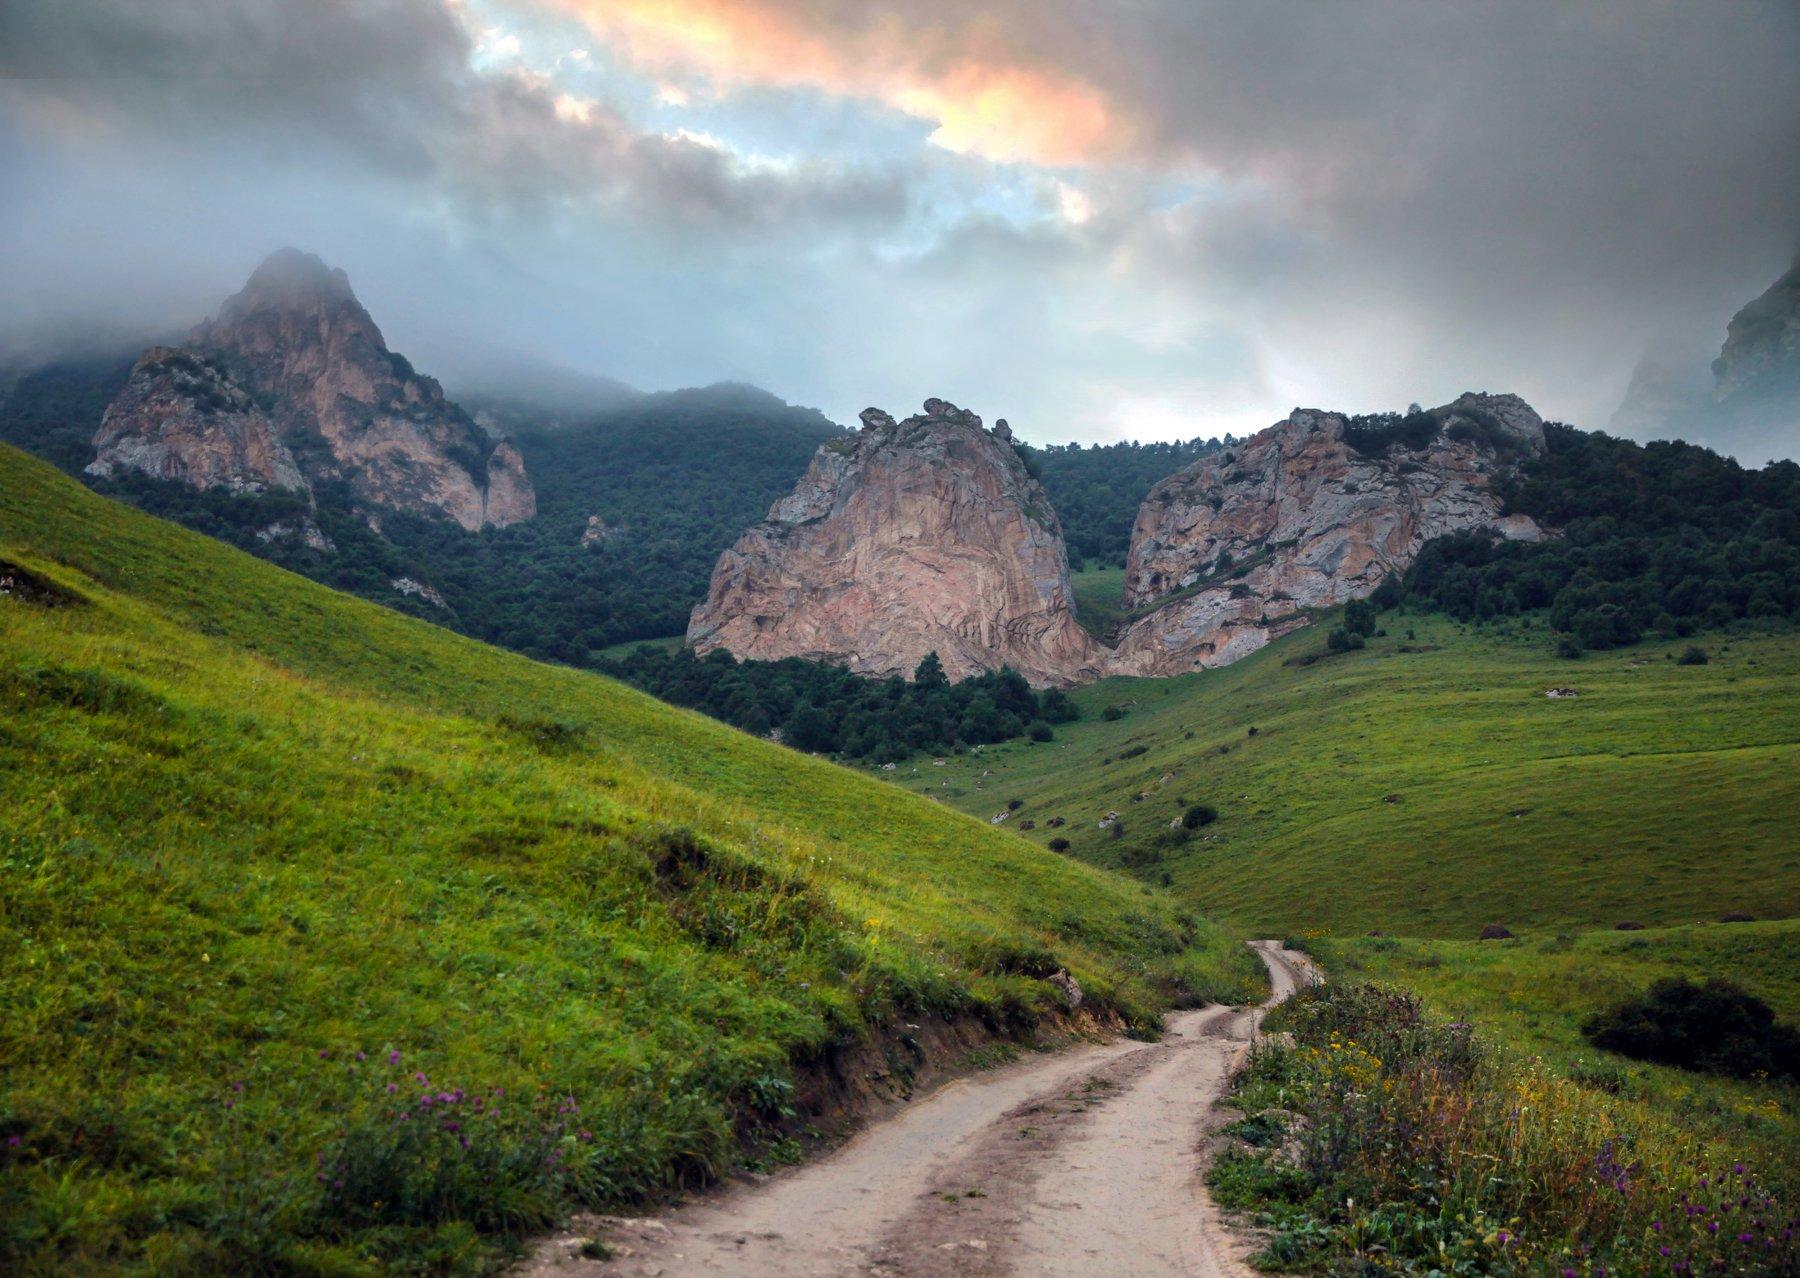 горы,лето,пейзаж,туман,чегем,балкария, Марат Магов